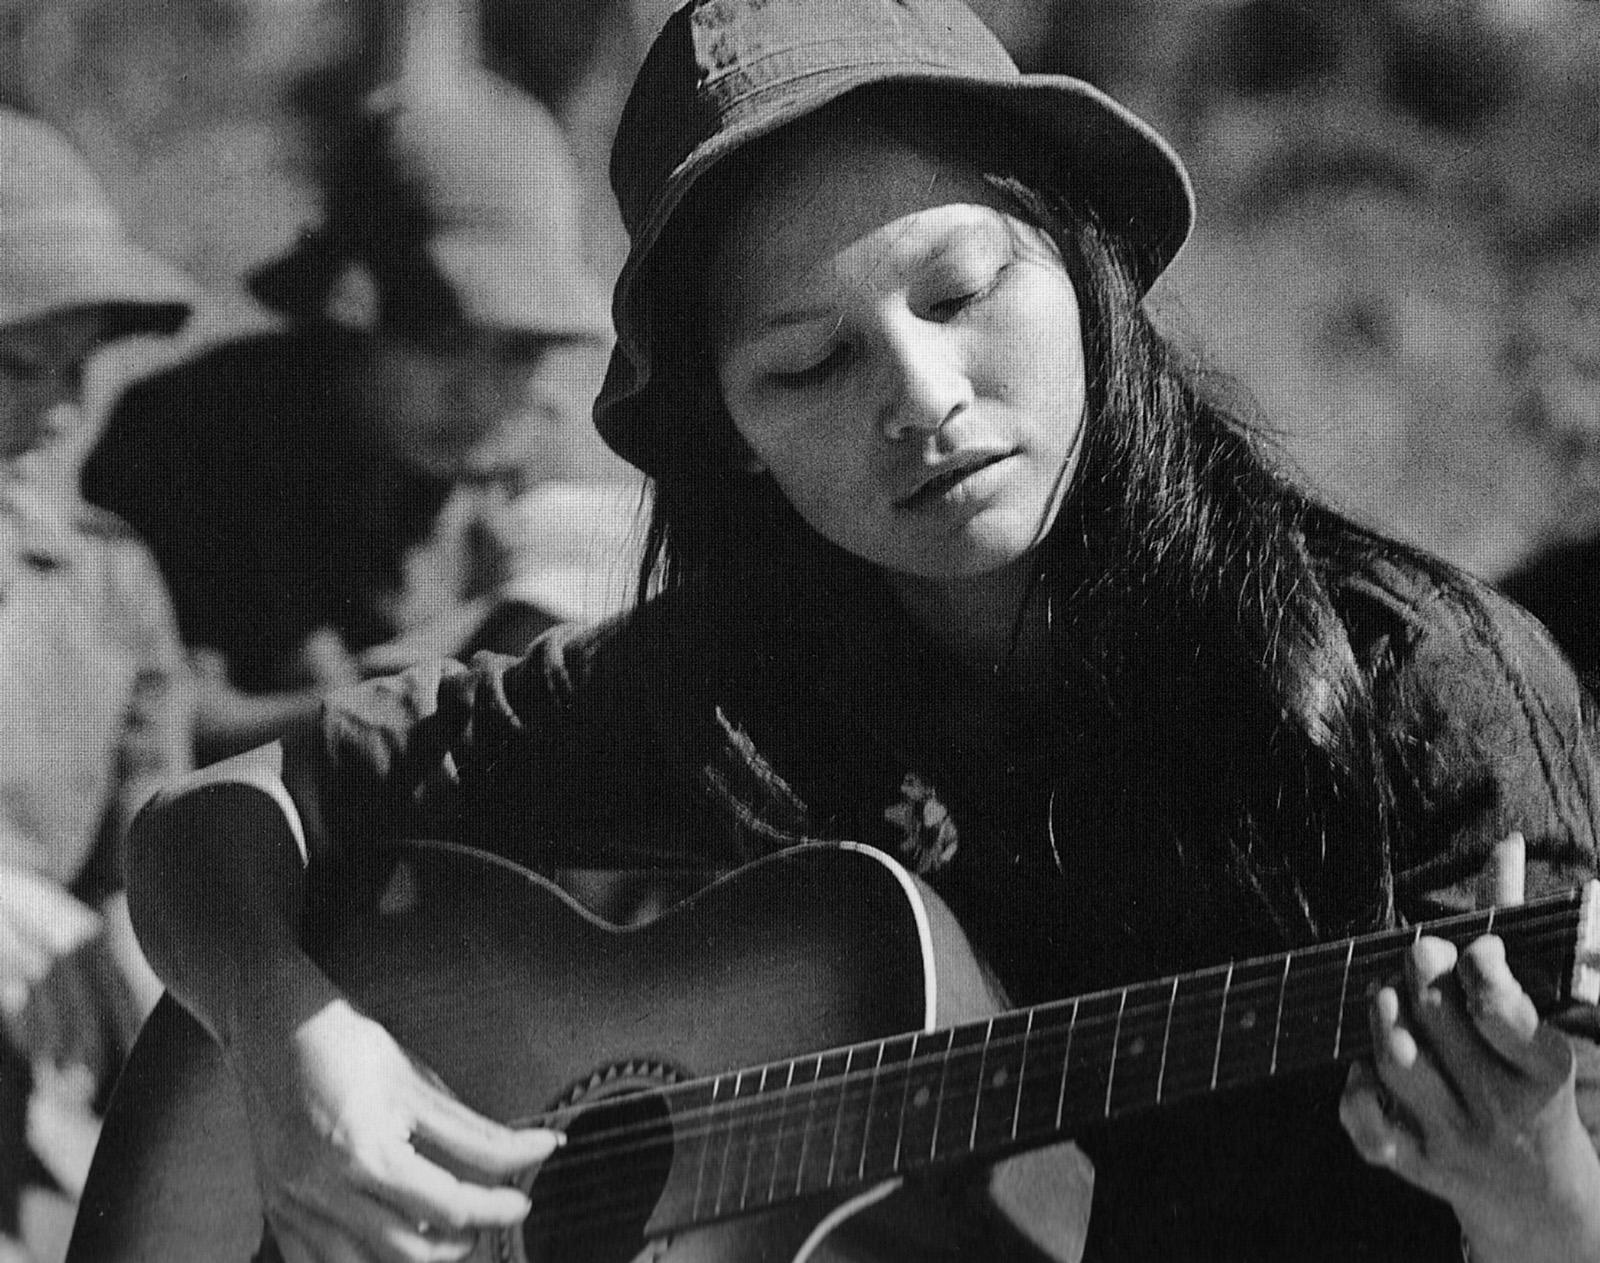 1970_youth_brigade_volunteer_playing_guitar_at_hcm_trail.jpg